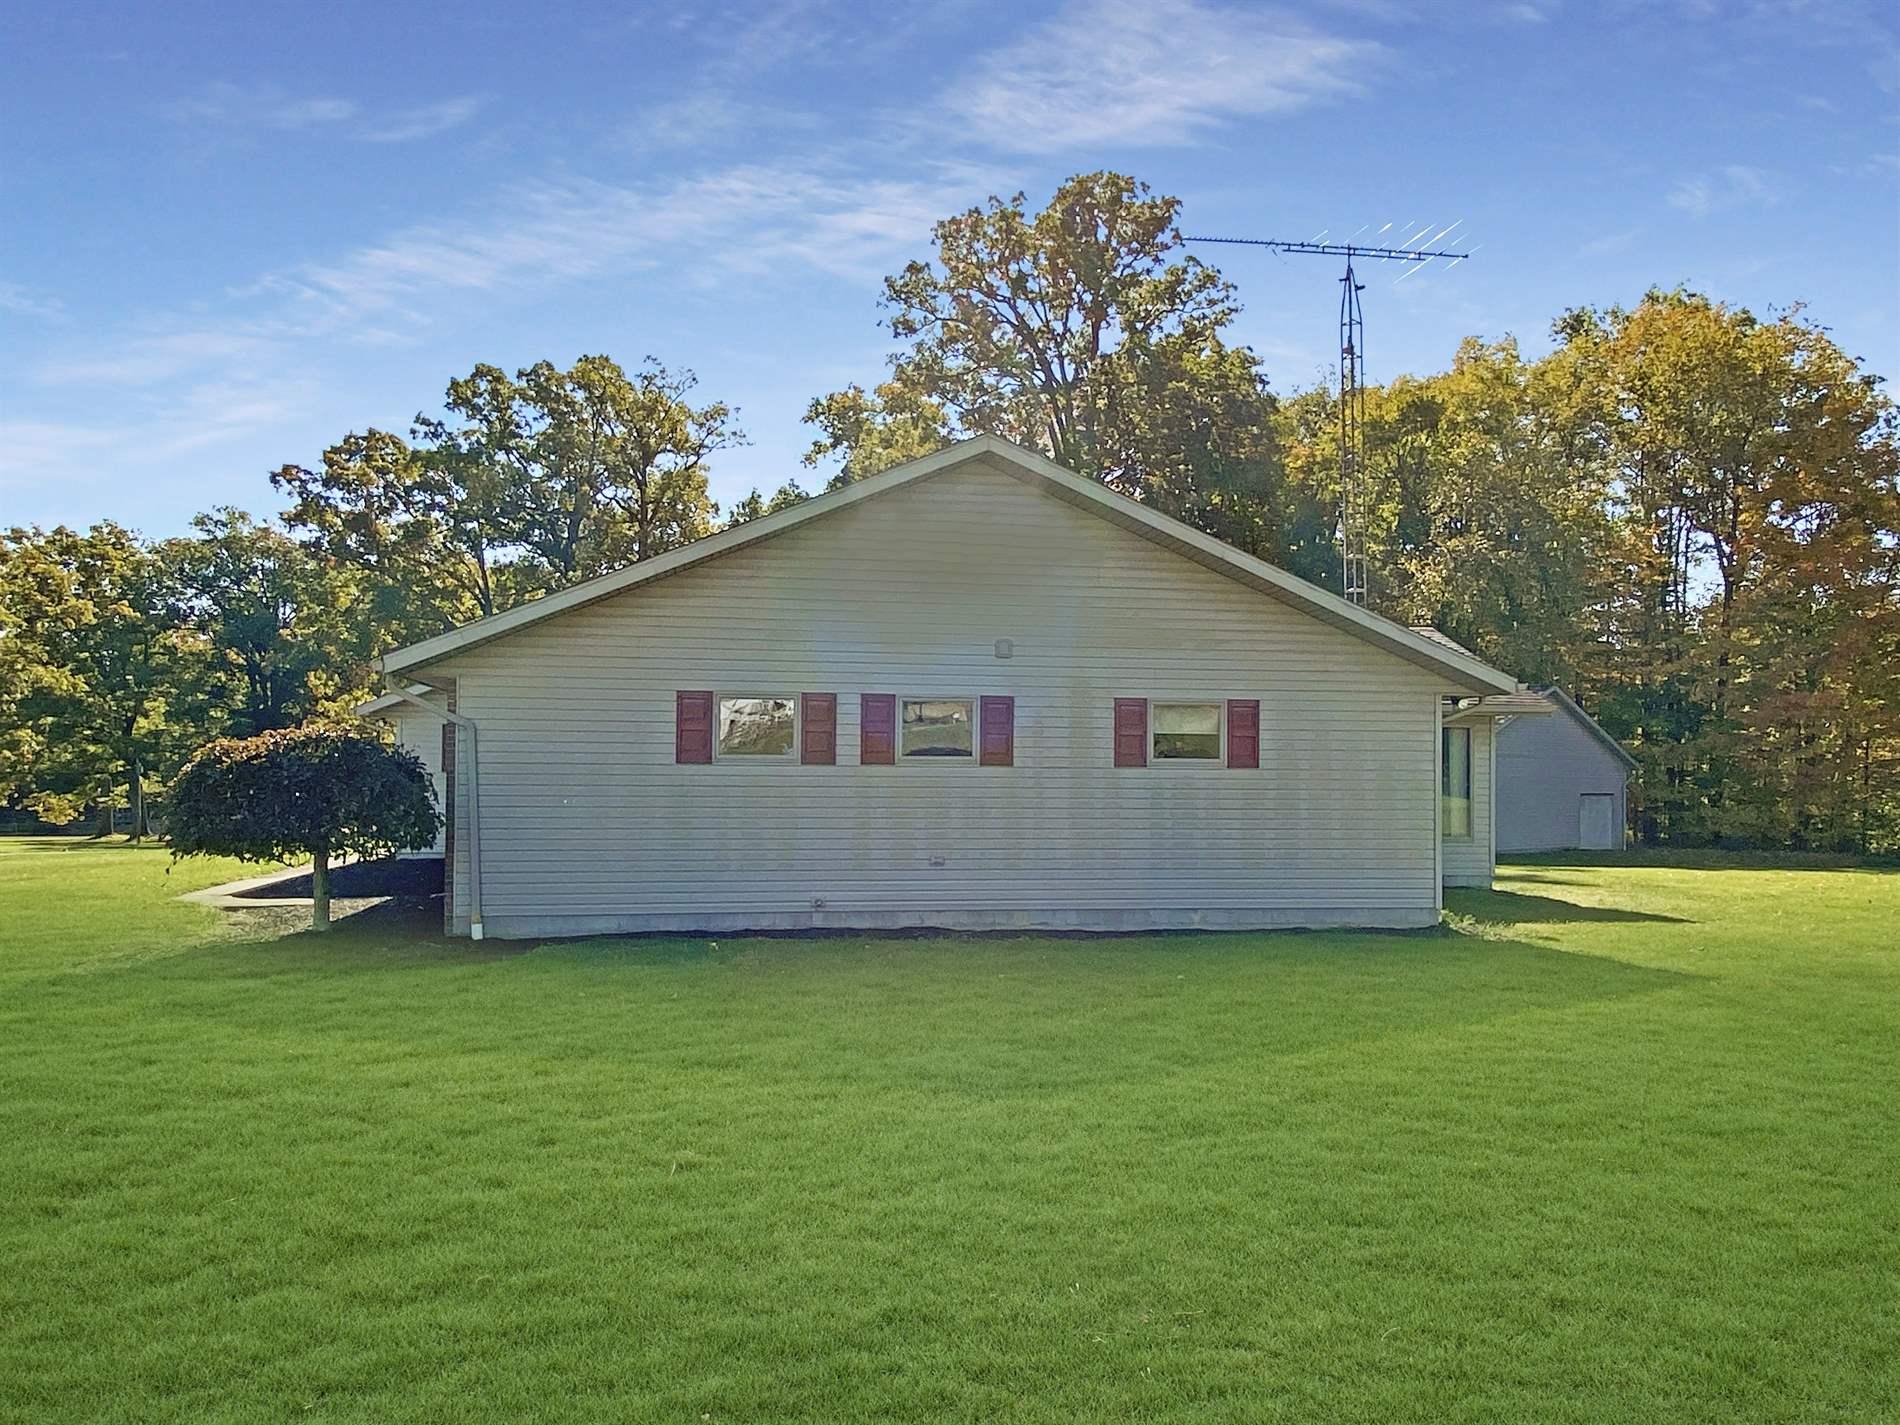 563 Twp Rd 1275, Ashland, OH 44805